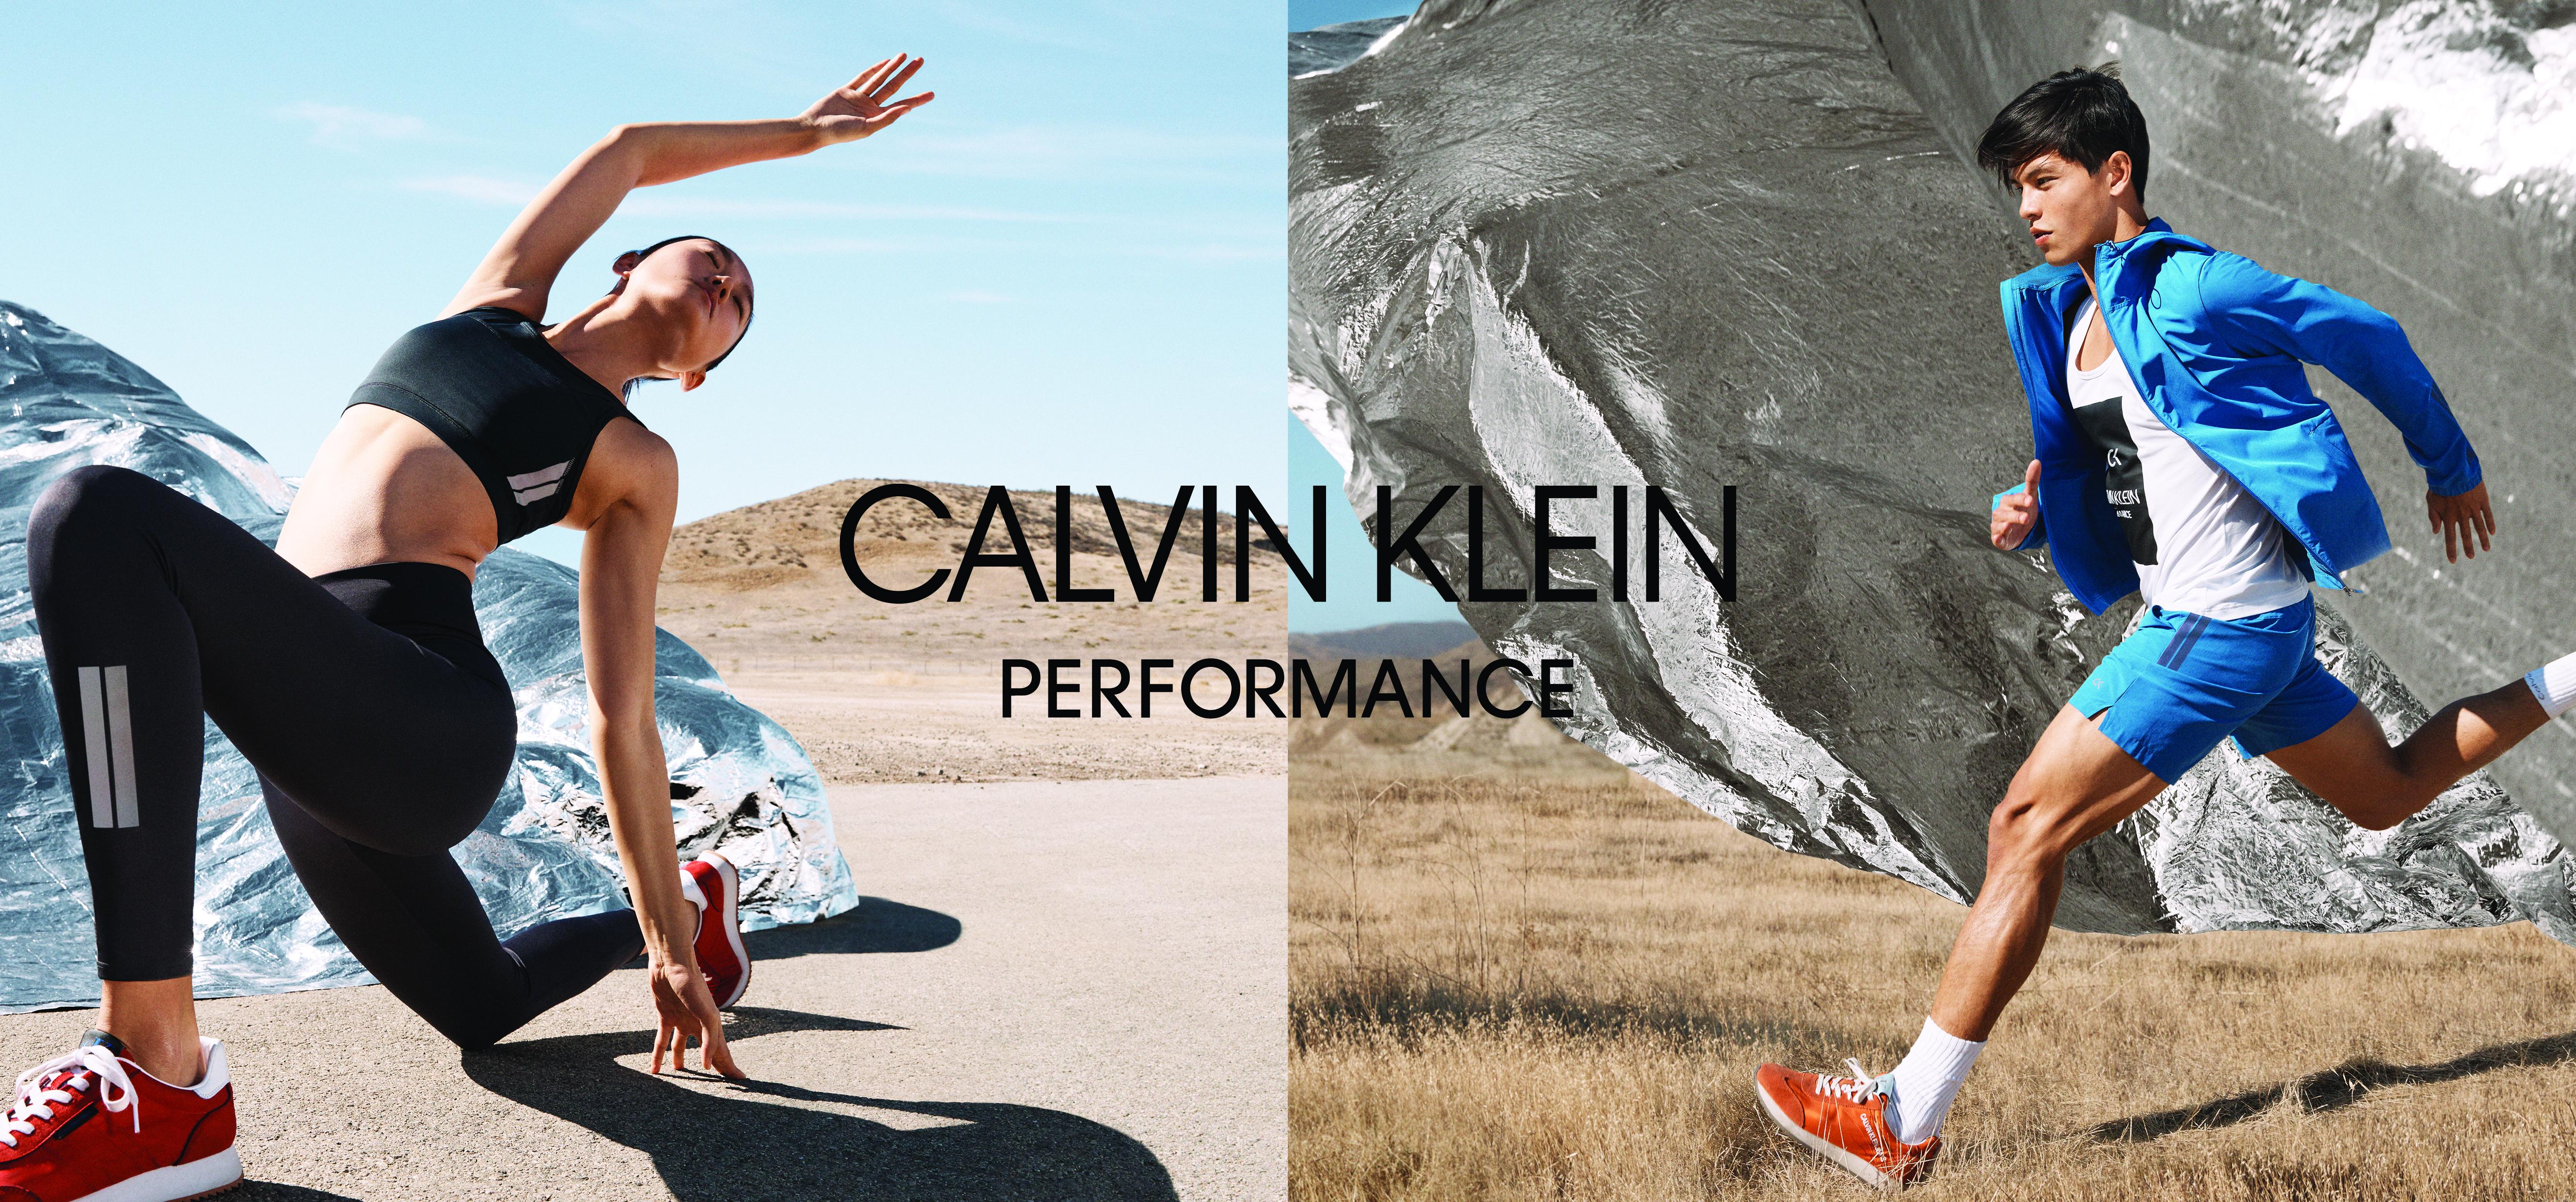 K11 × Calvin Klein Performance︰芭蕾伸展操工作坊 - WELLNESS - K11